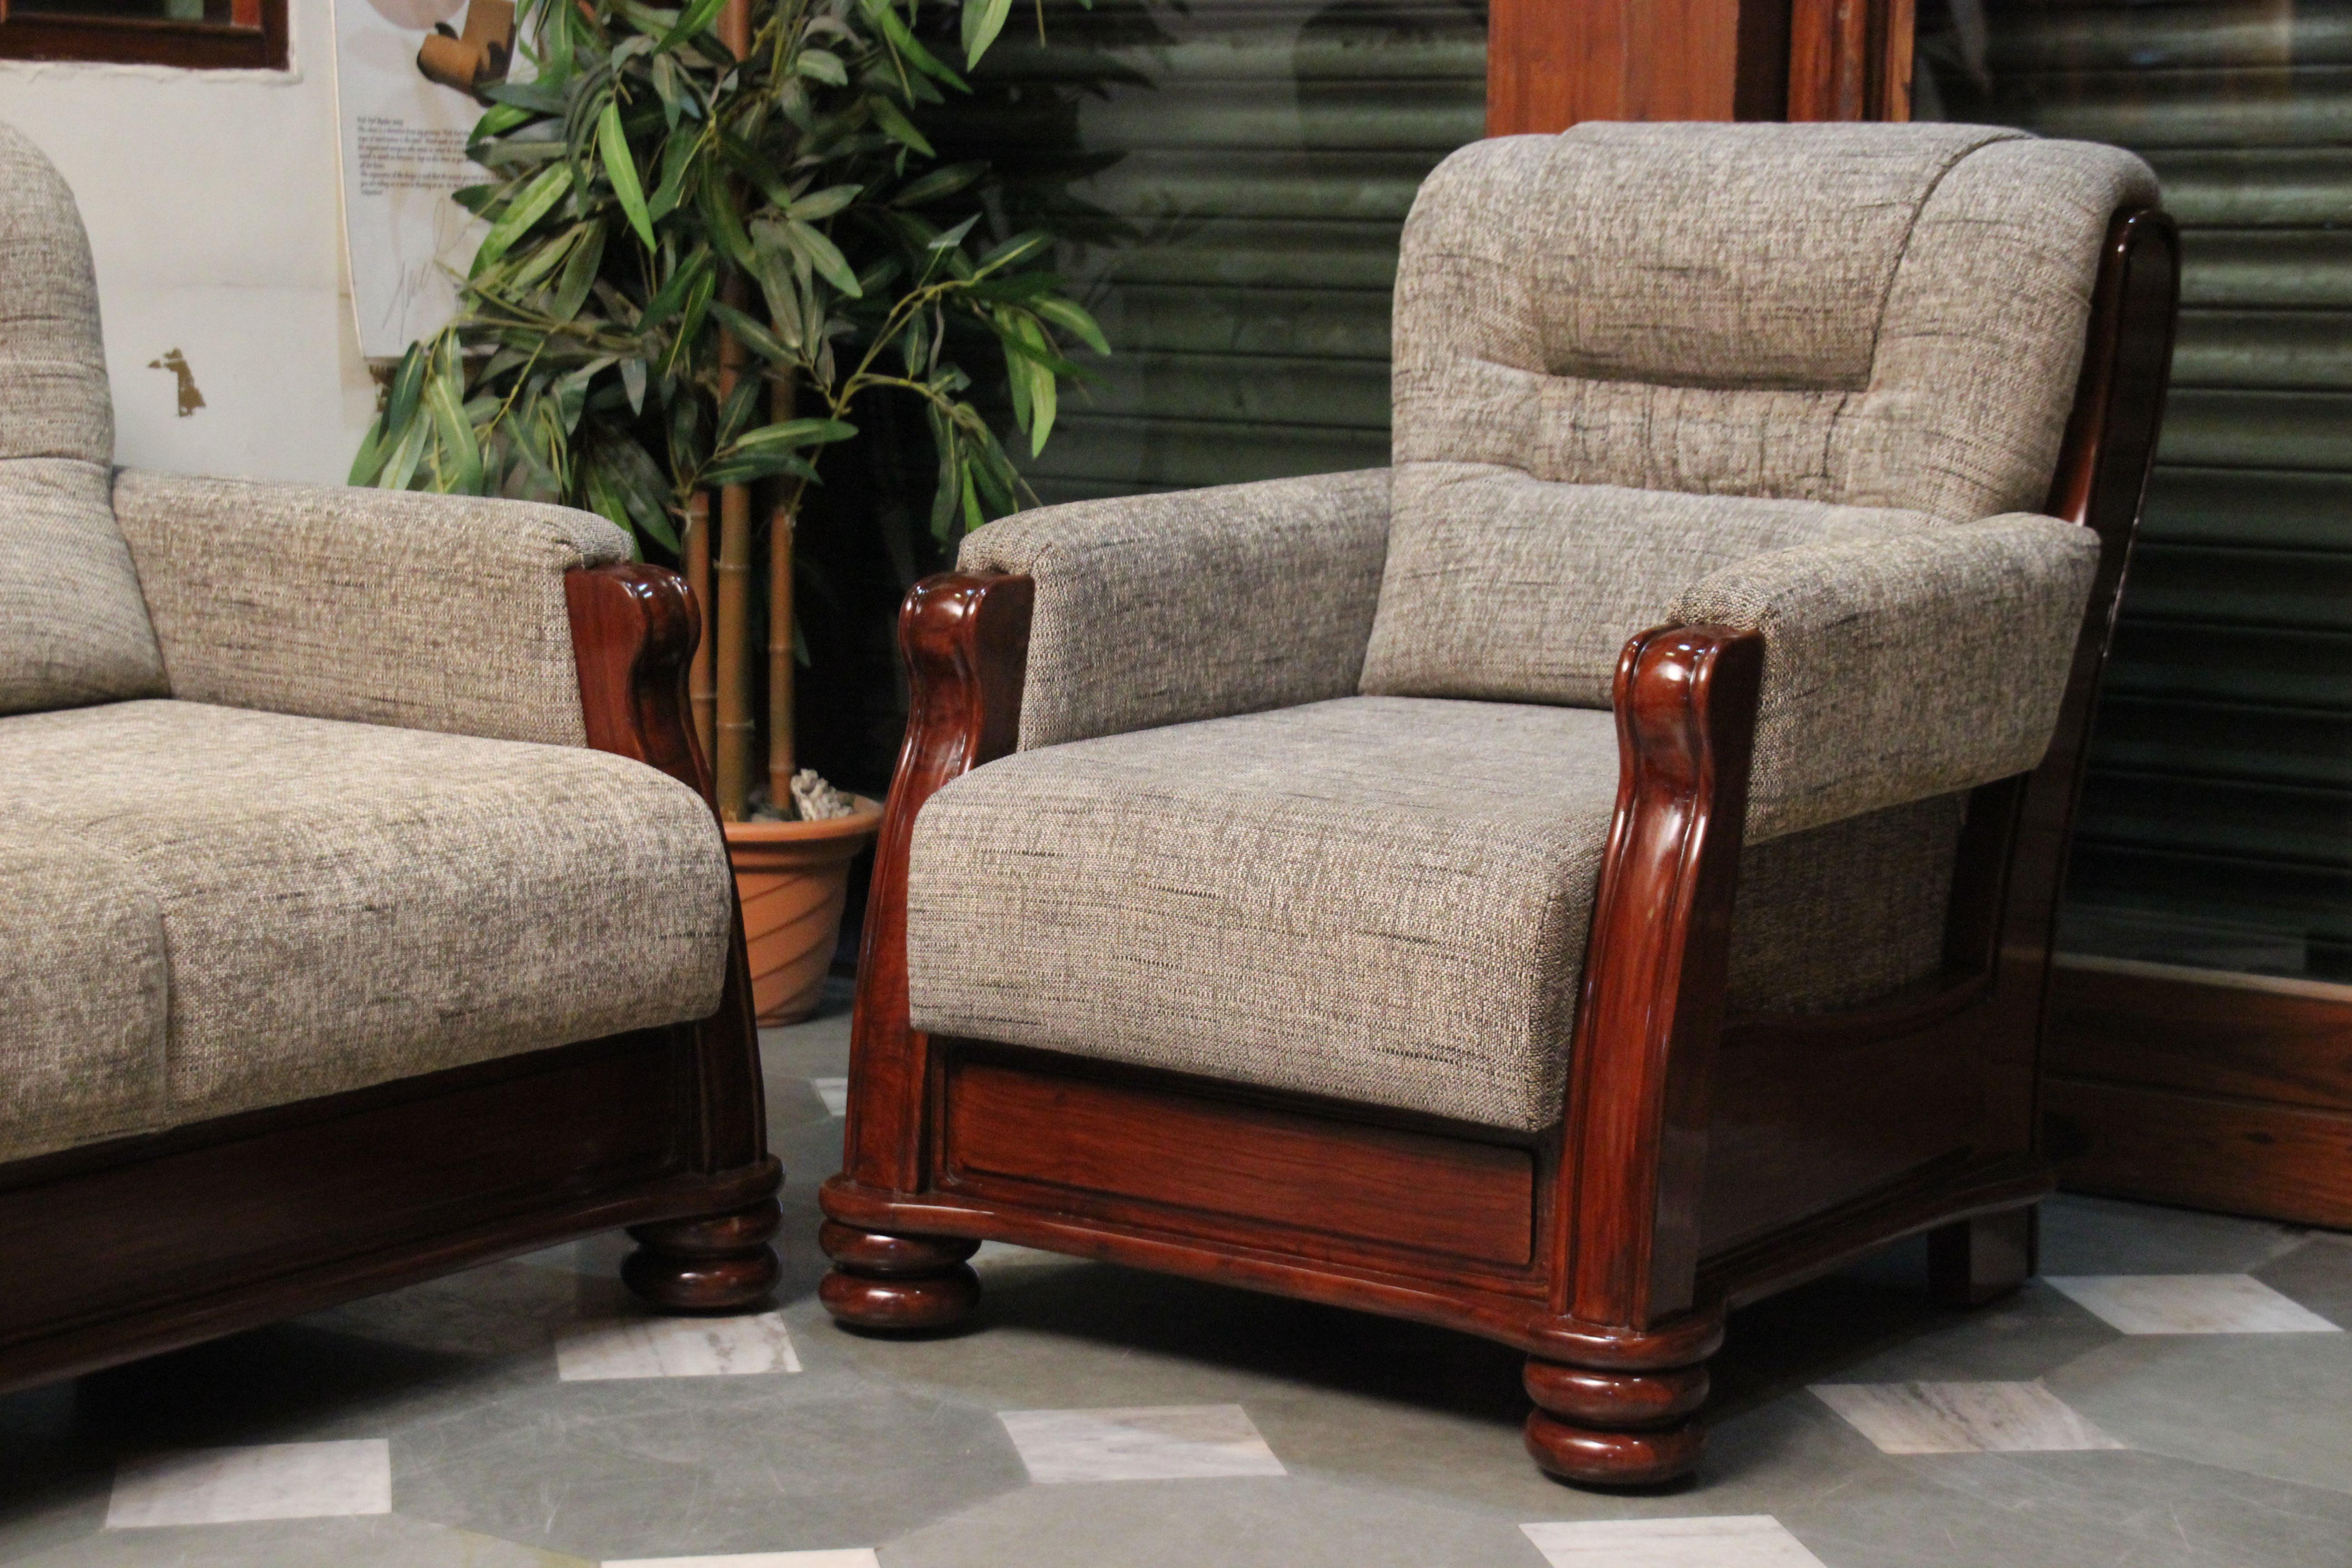 Teak Wood Sofa with Jute tapestry | Furniture Designs ...